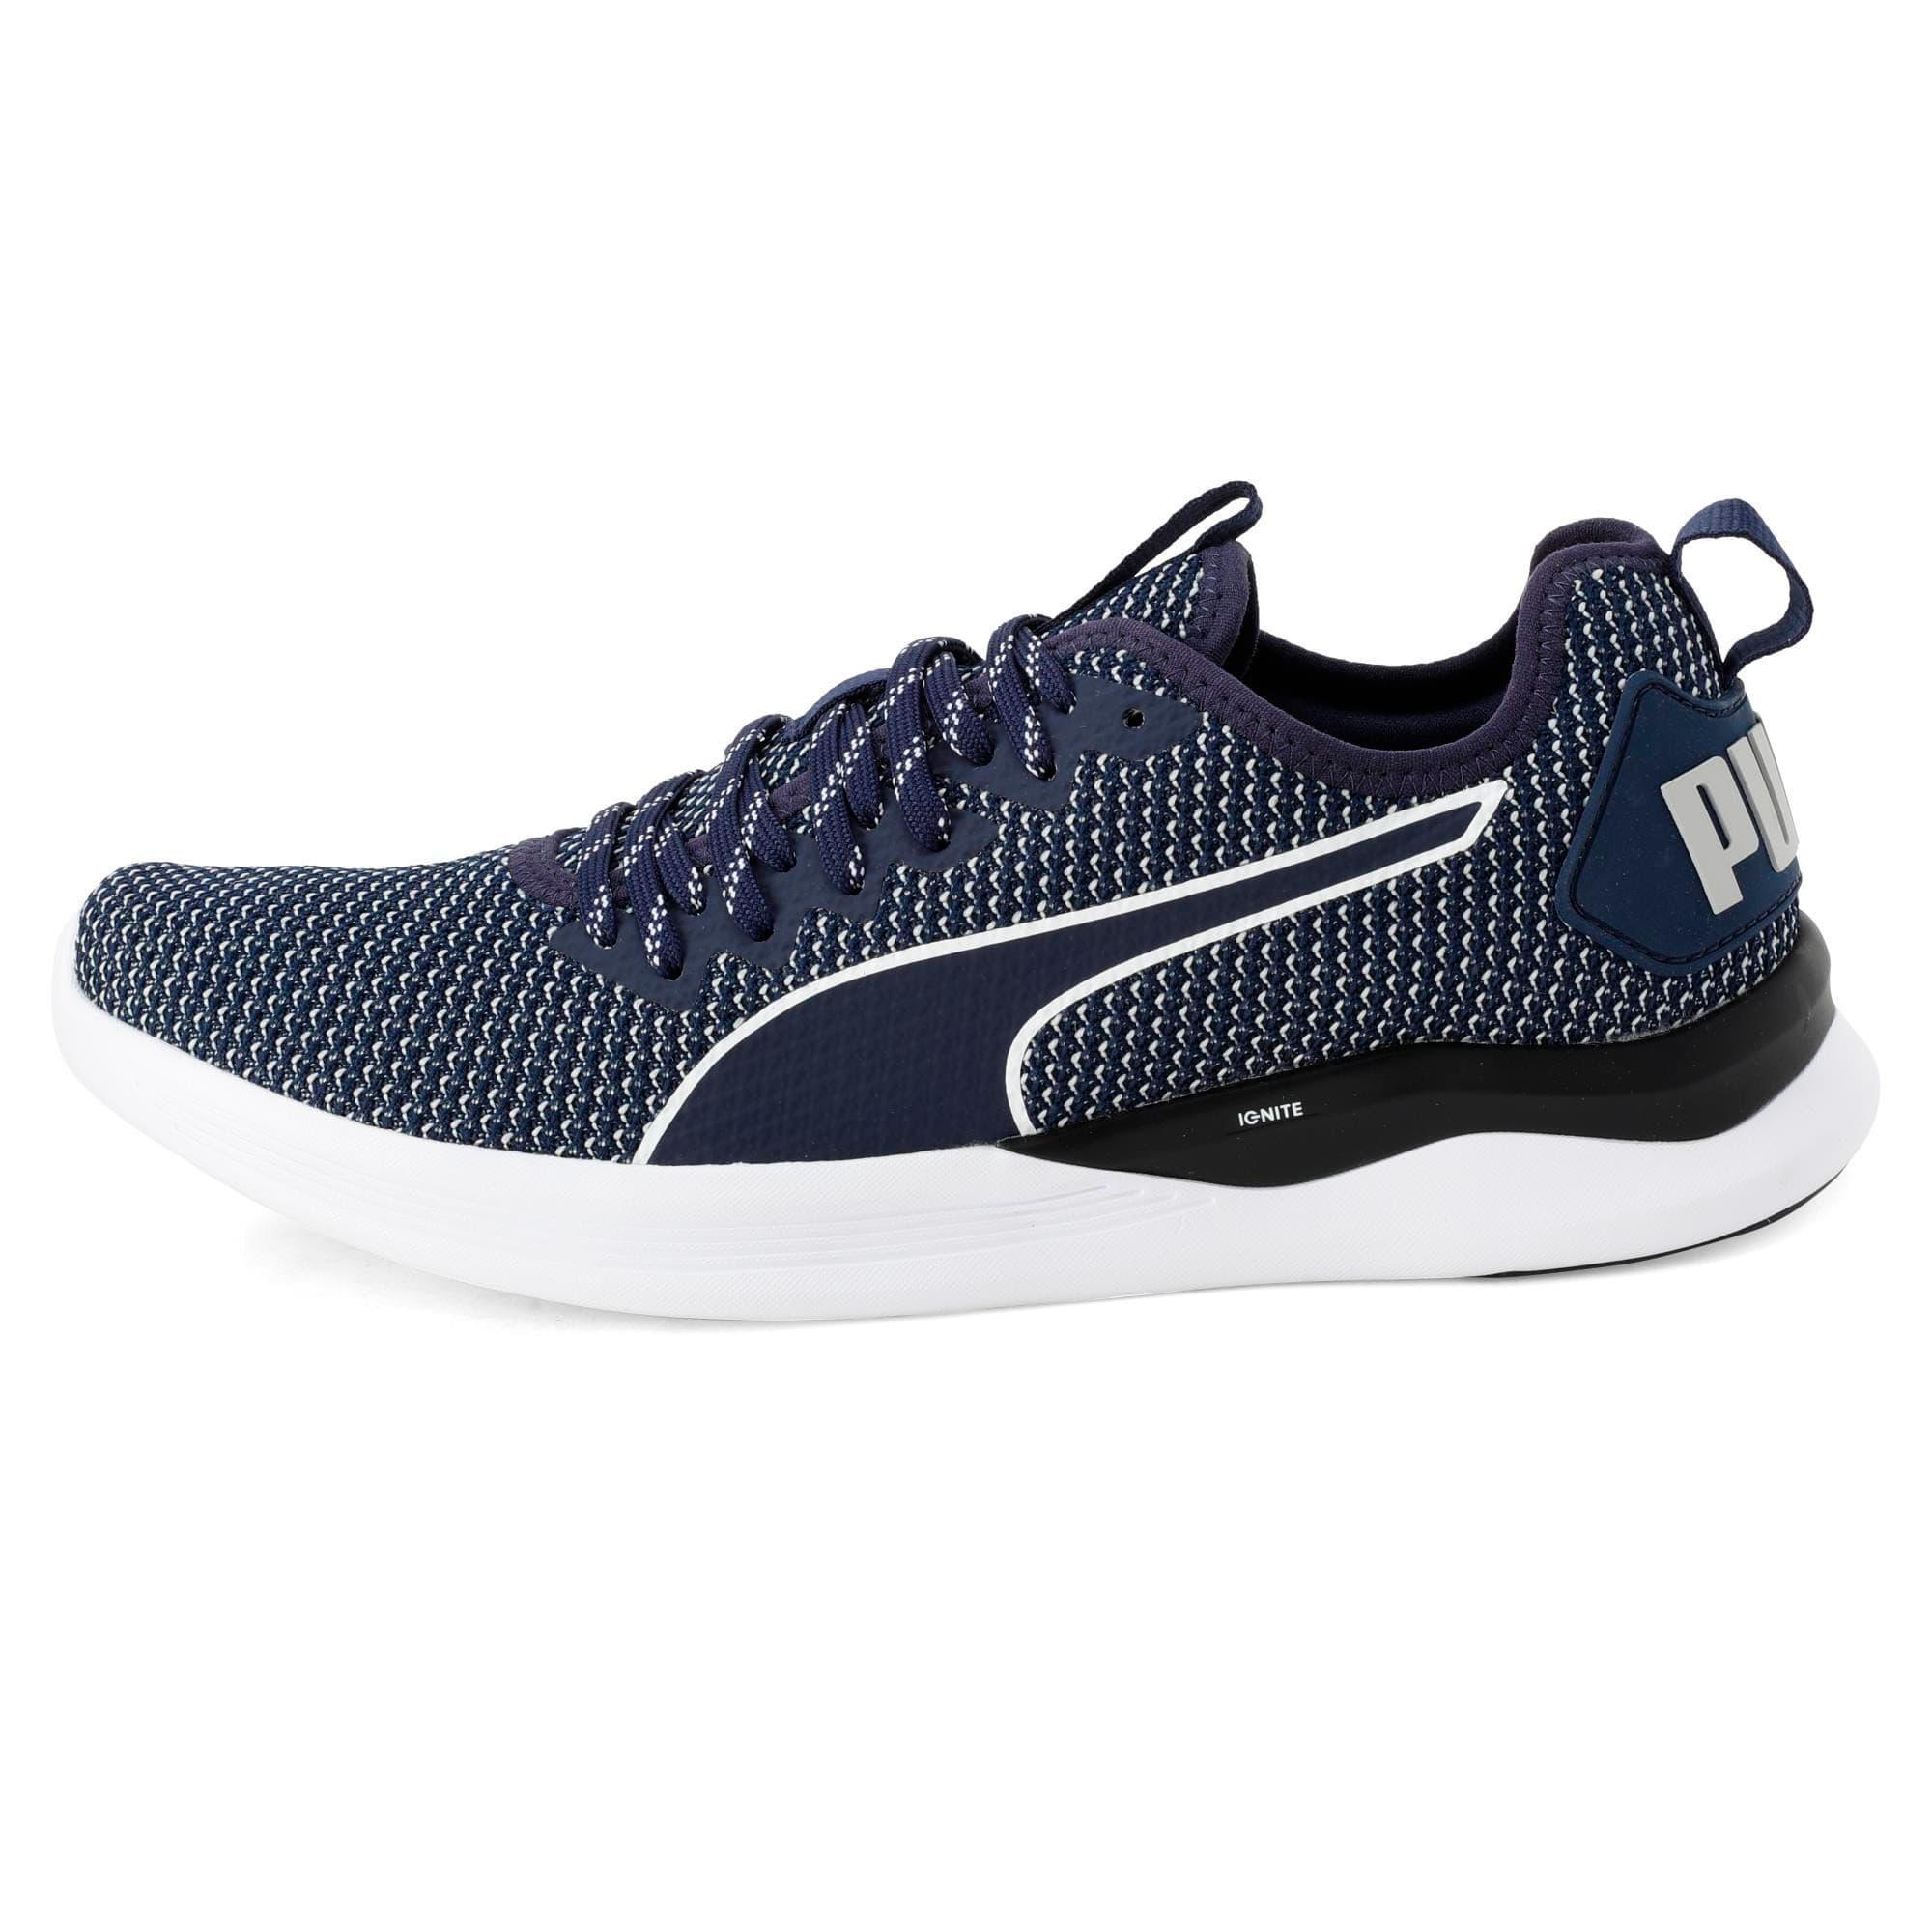 Thumbnail 1 of IGNITE Flash FS Men's Running Shoes, Peacoat-Glacier Gray-White, medium-IND